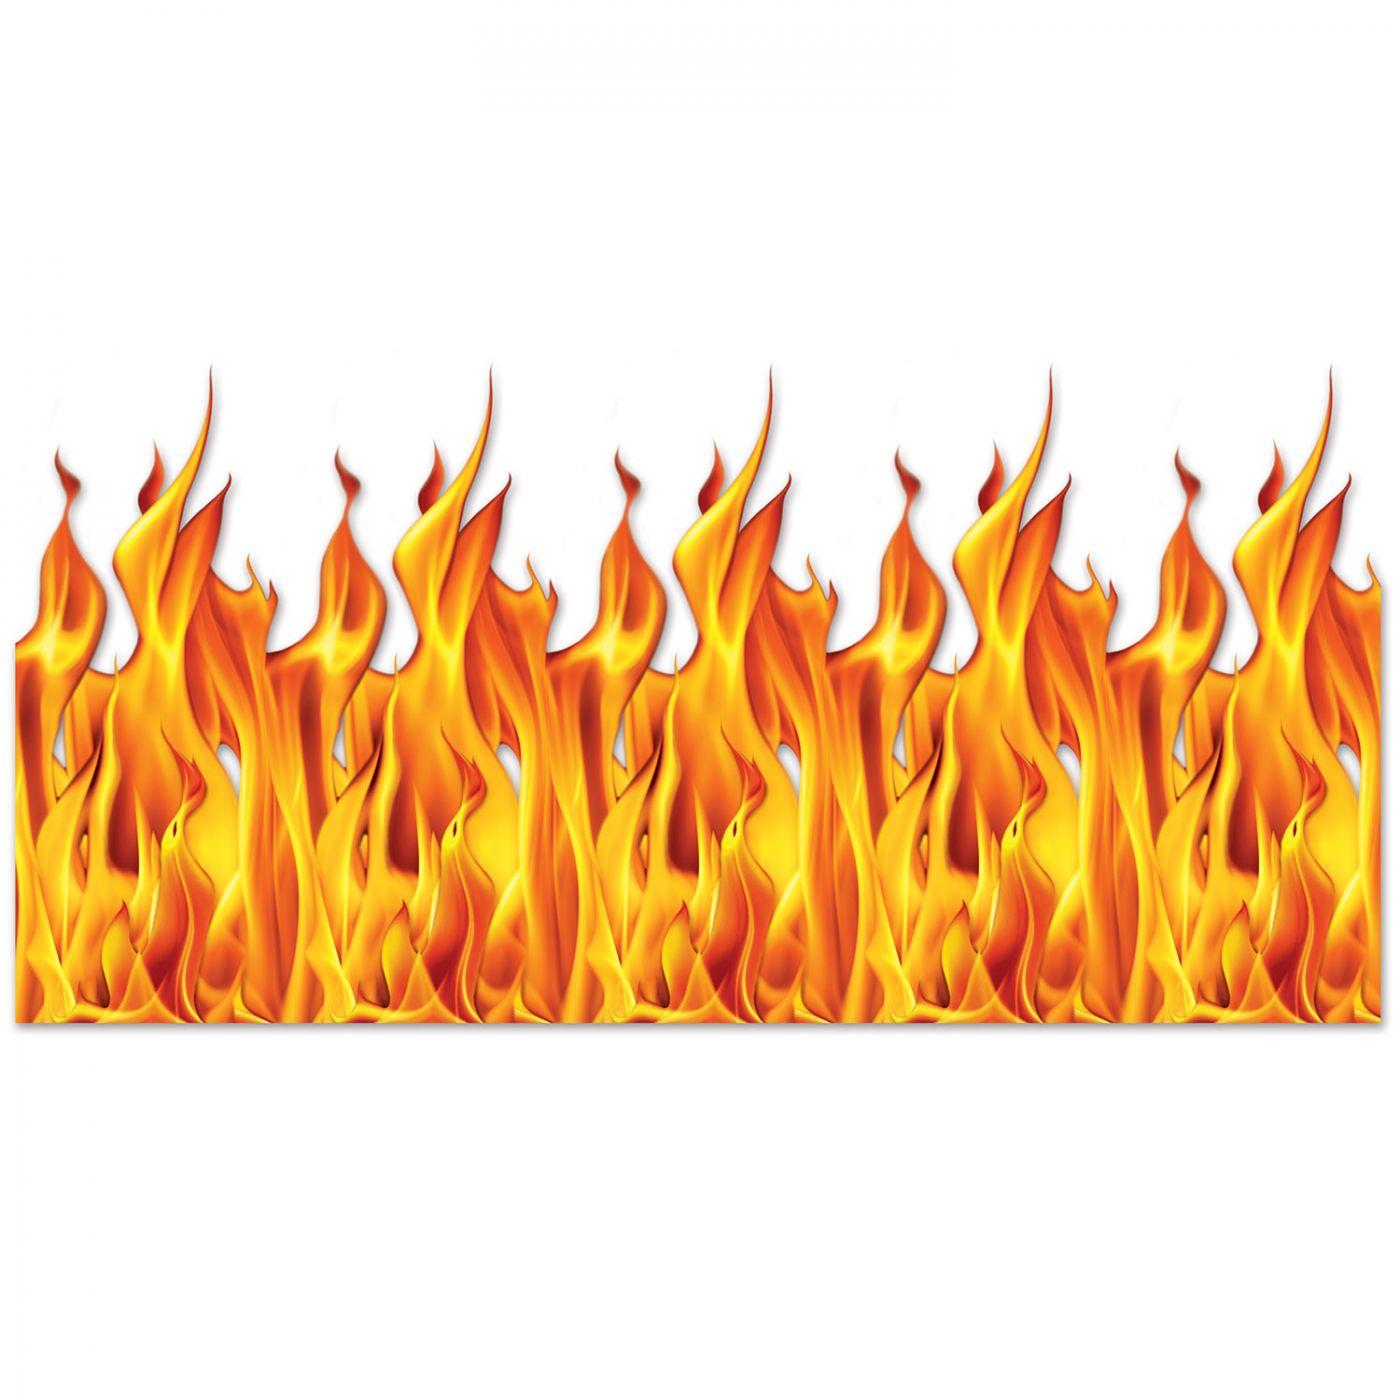 Flame Backdrop (6) image